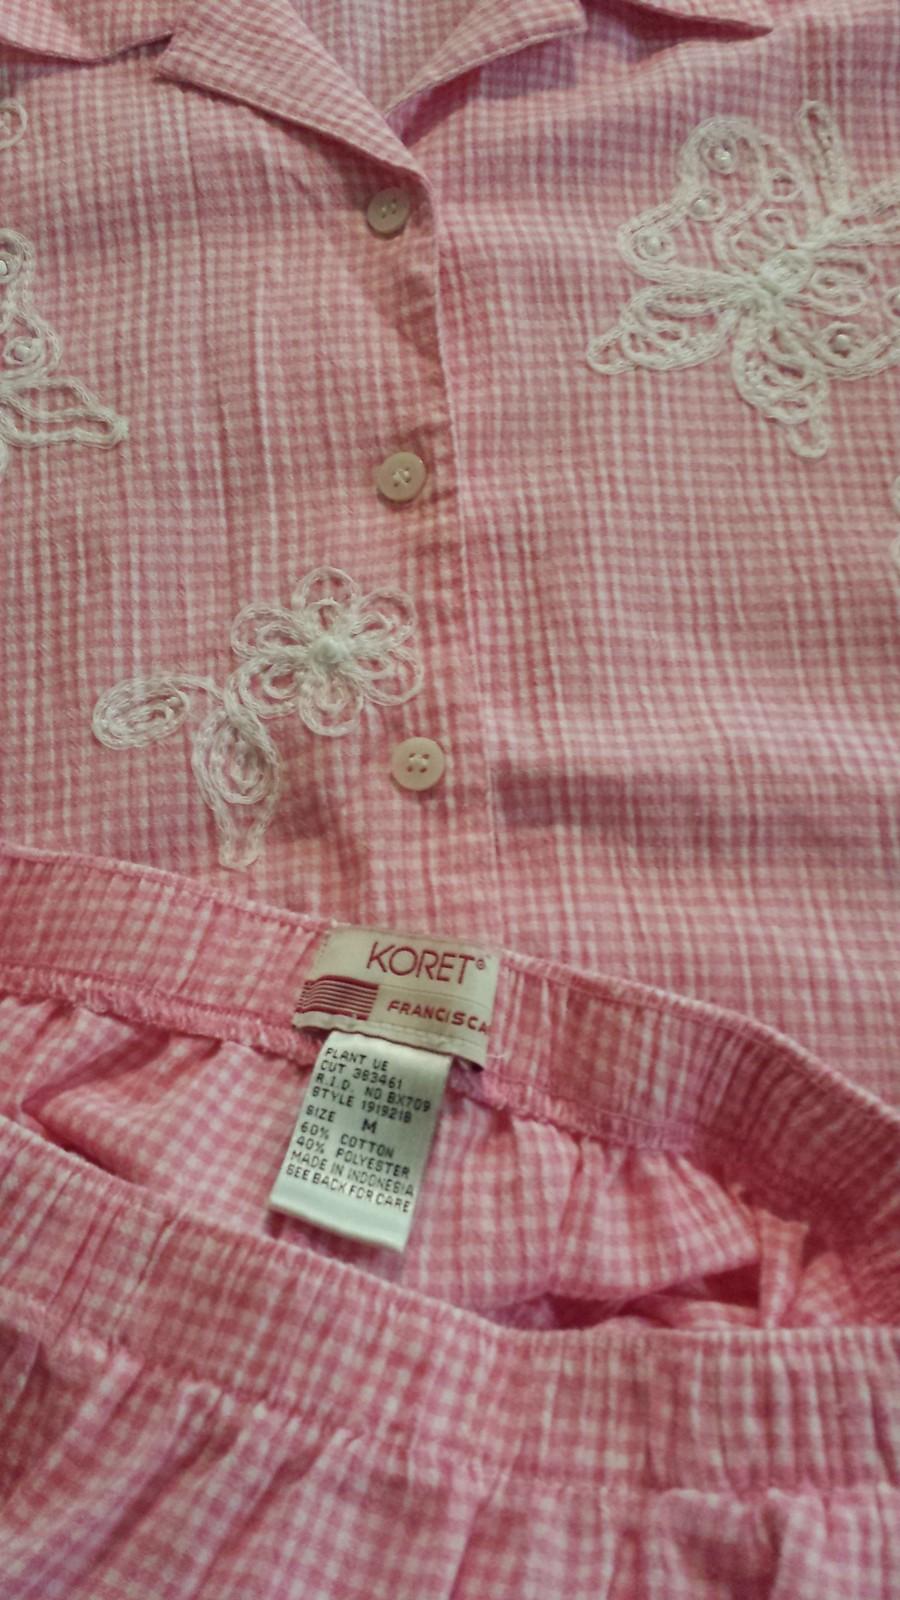 Koret Light Pink Butterfly & Flowers Blouse Womans Outfit M Medium Elastic Capri